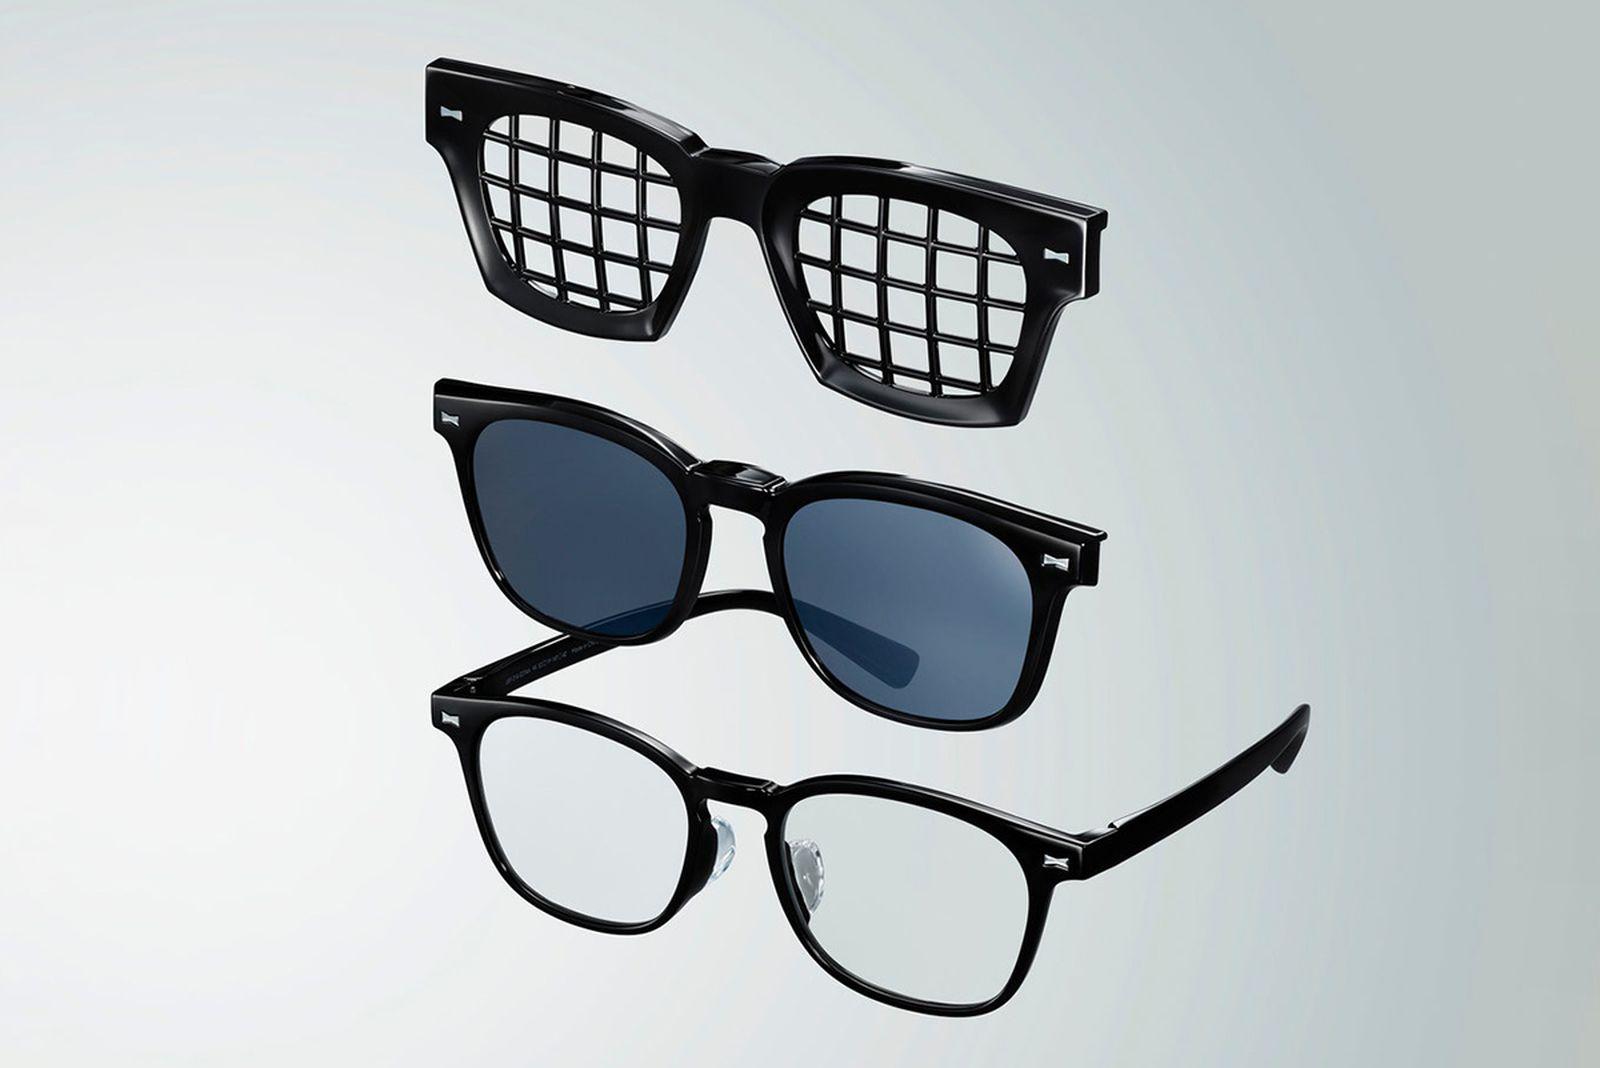 verdy-jins-sun-nigo-glasses-collab- (4)